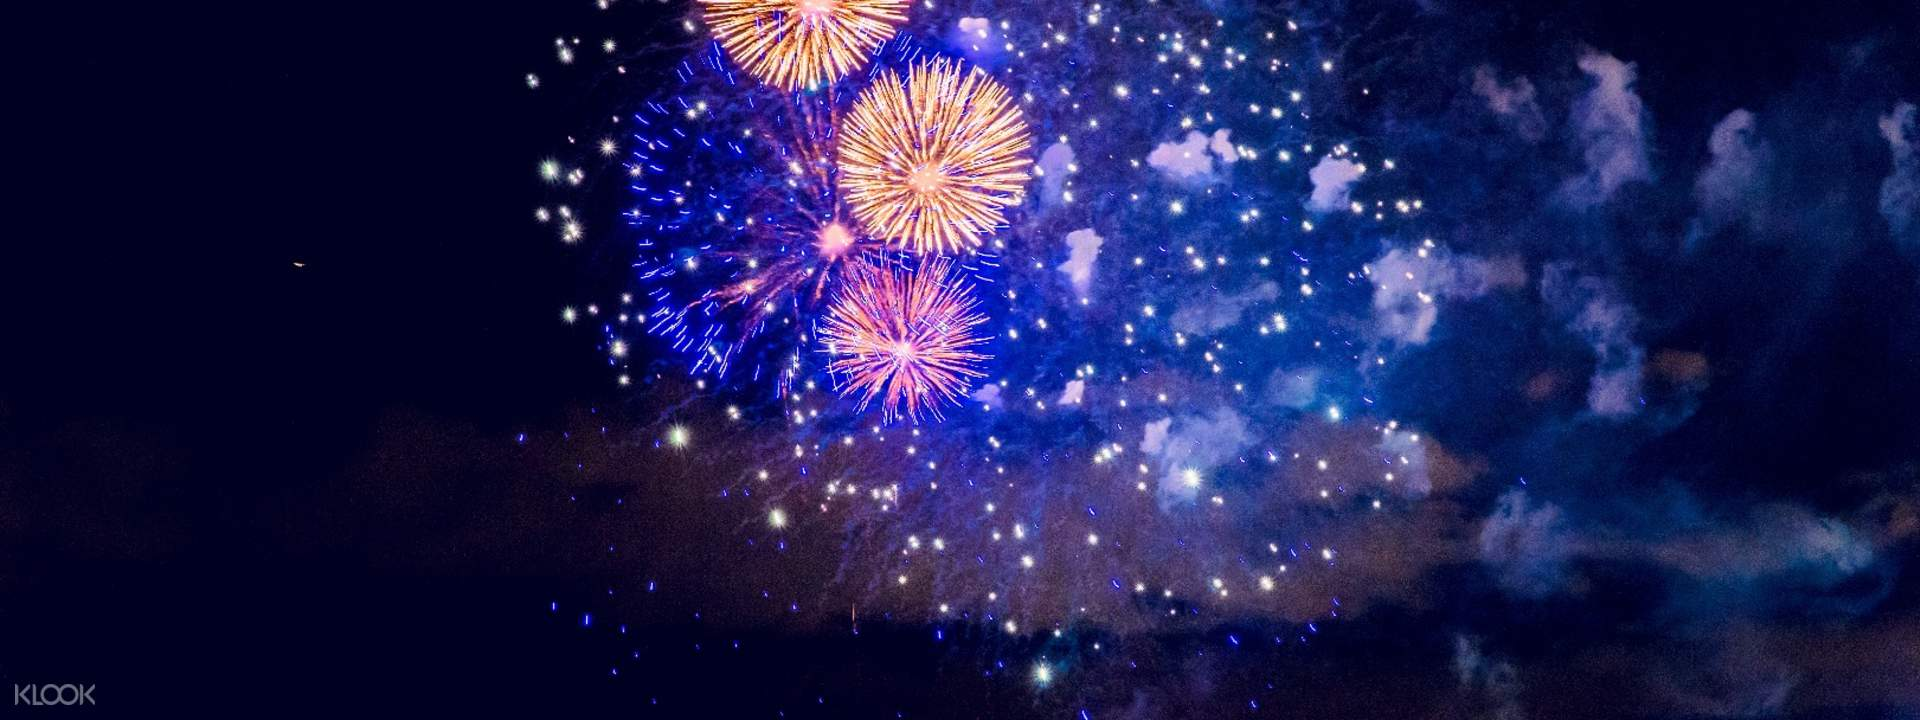 2018 Chinese Lunar New Year Fireworks Amp Valentines Dinner